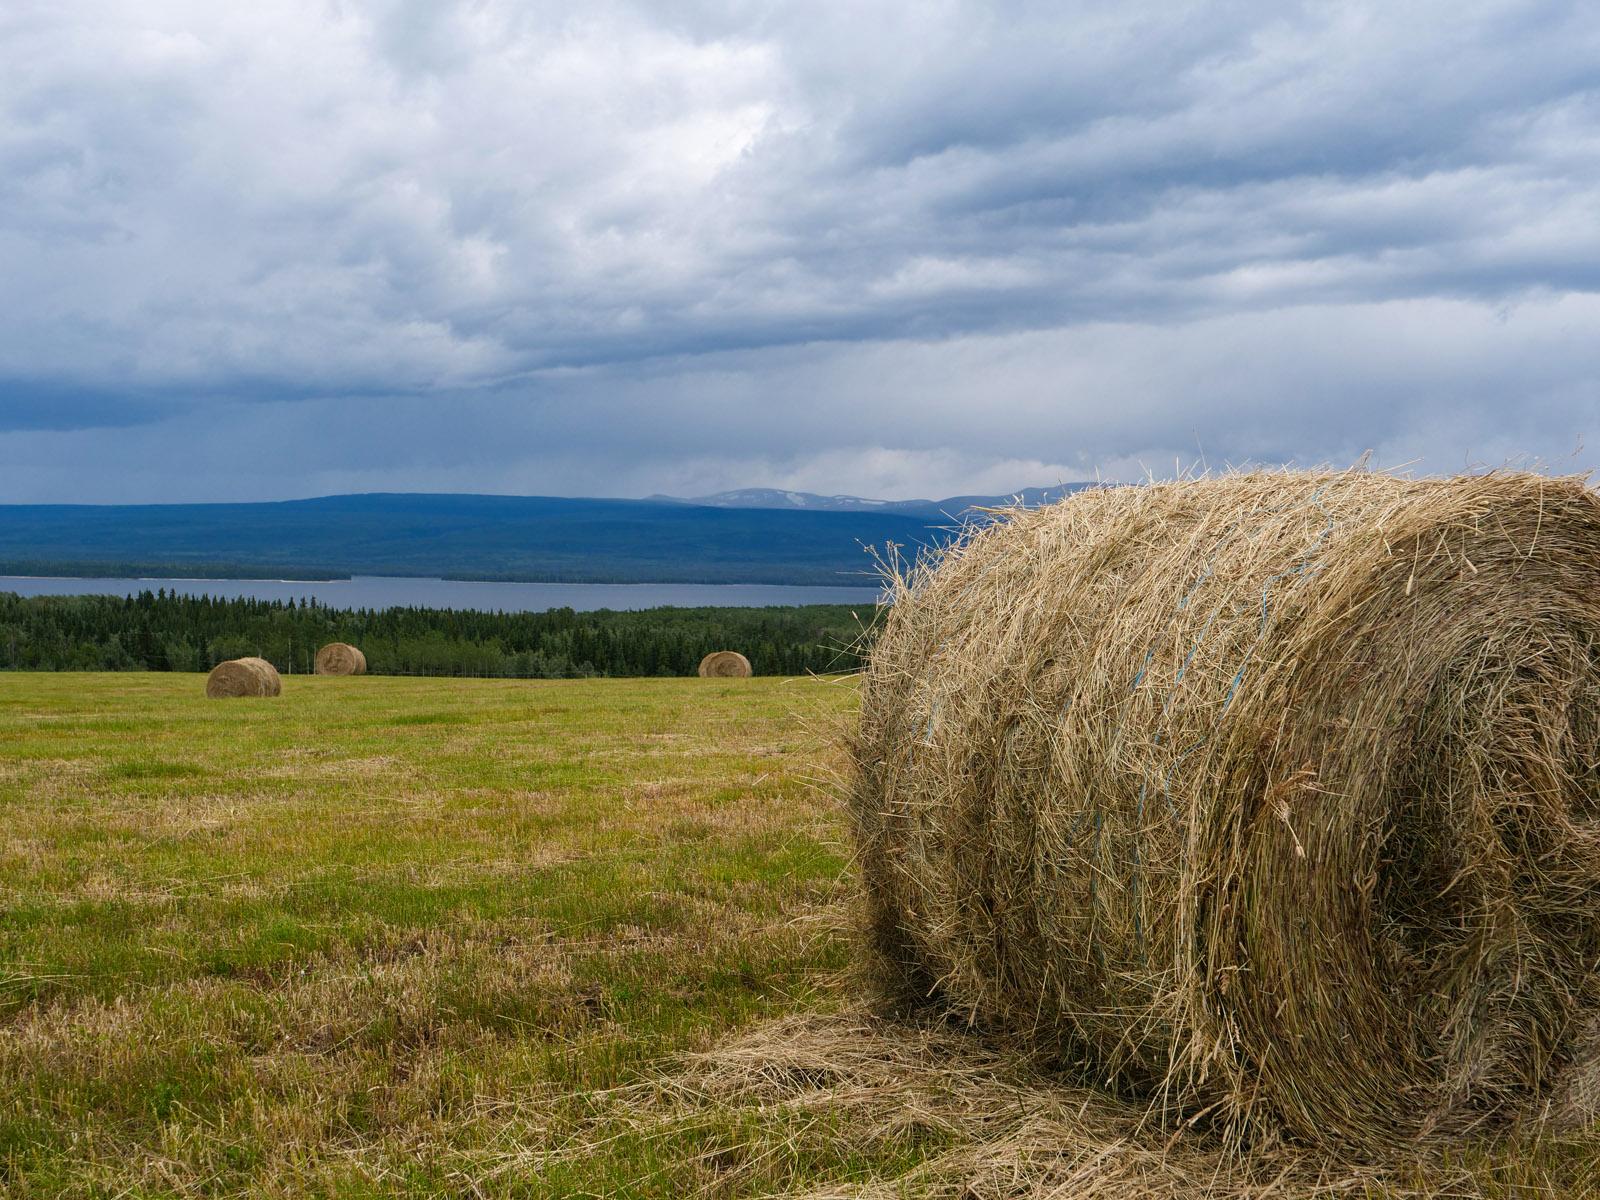 Wistaria farmland ootsa lake 30